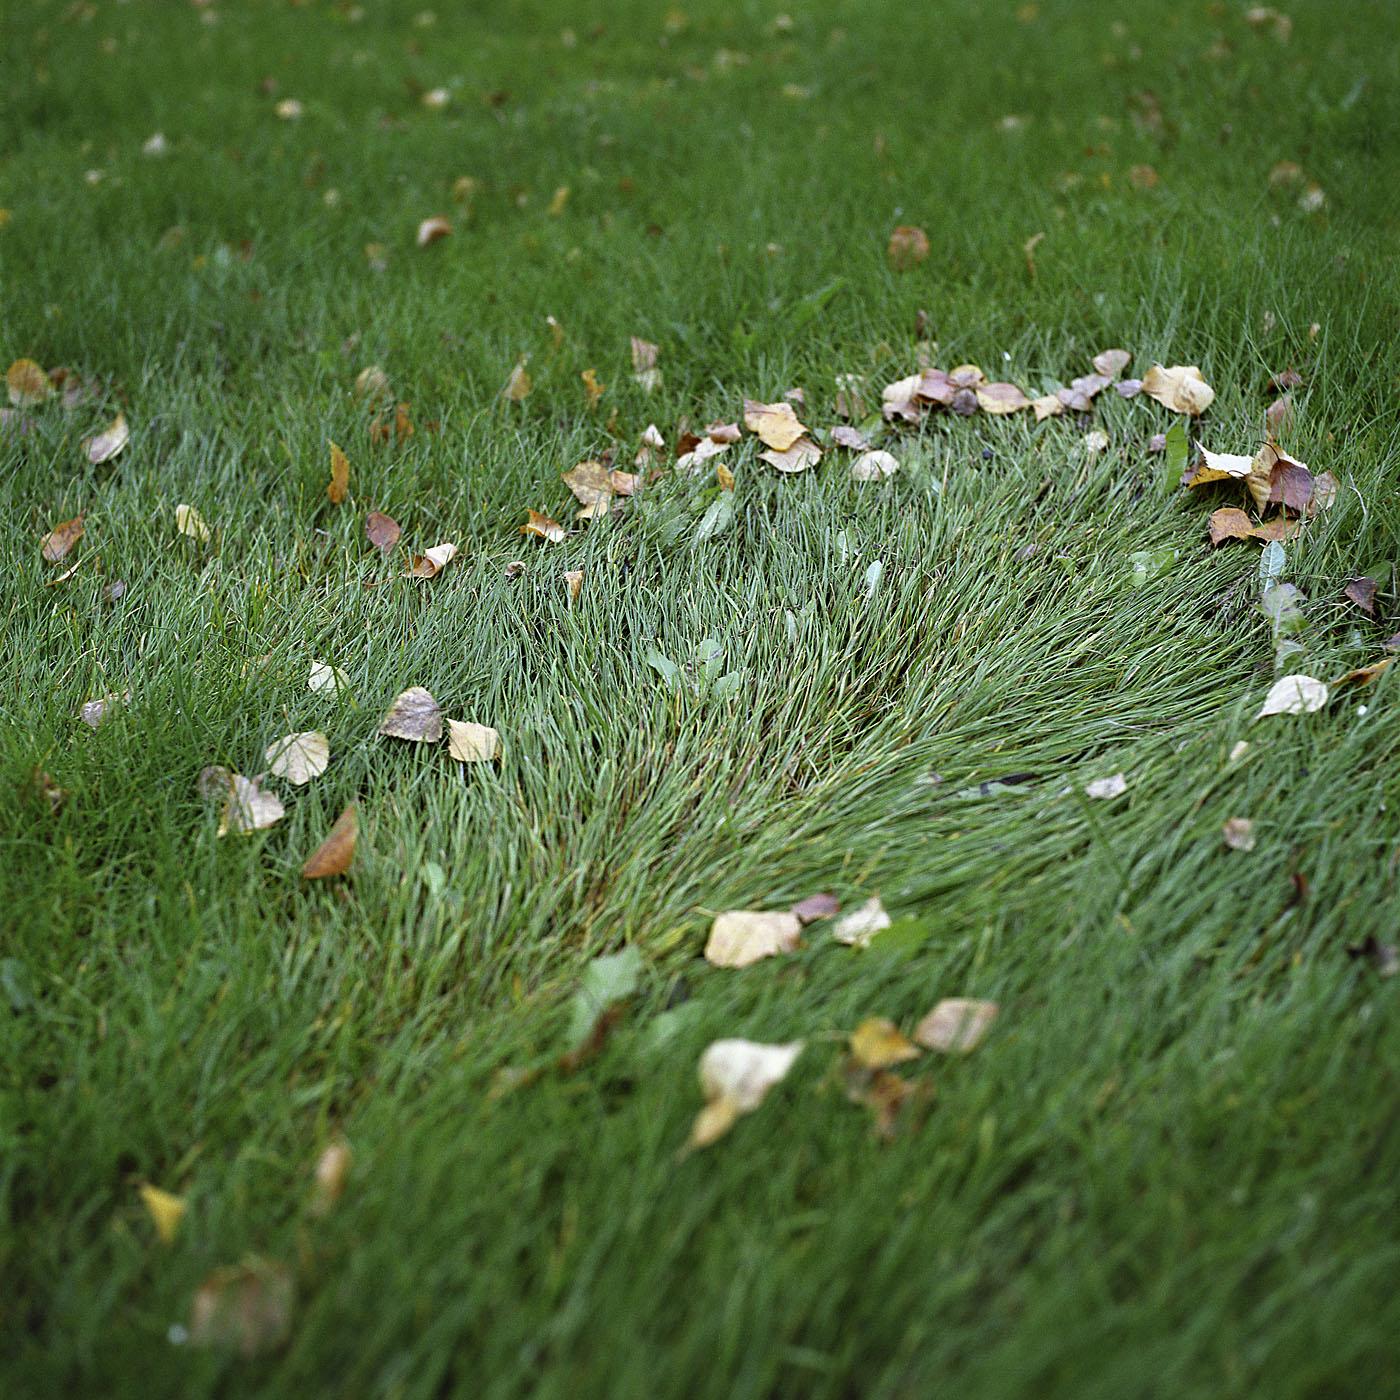 The Lawn_v01.jpg